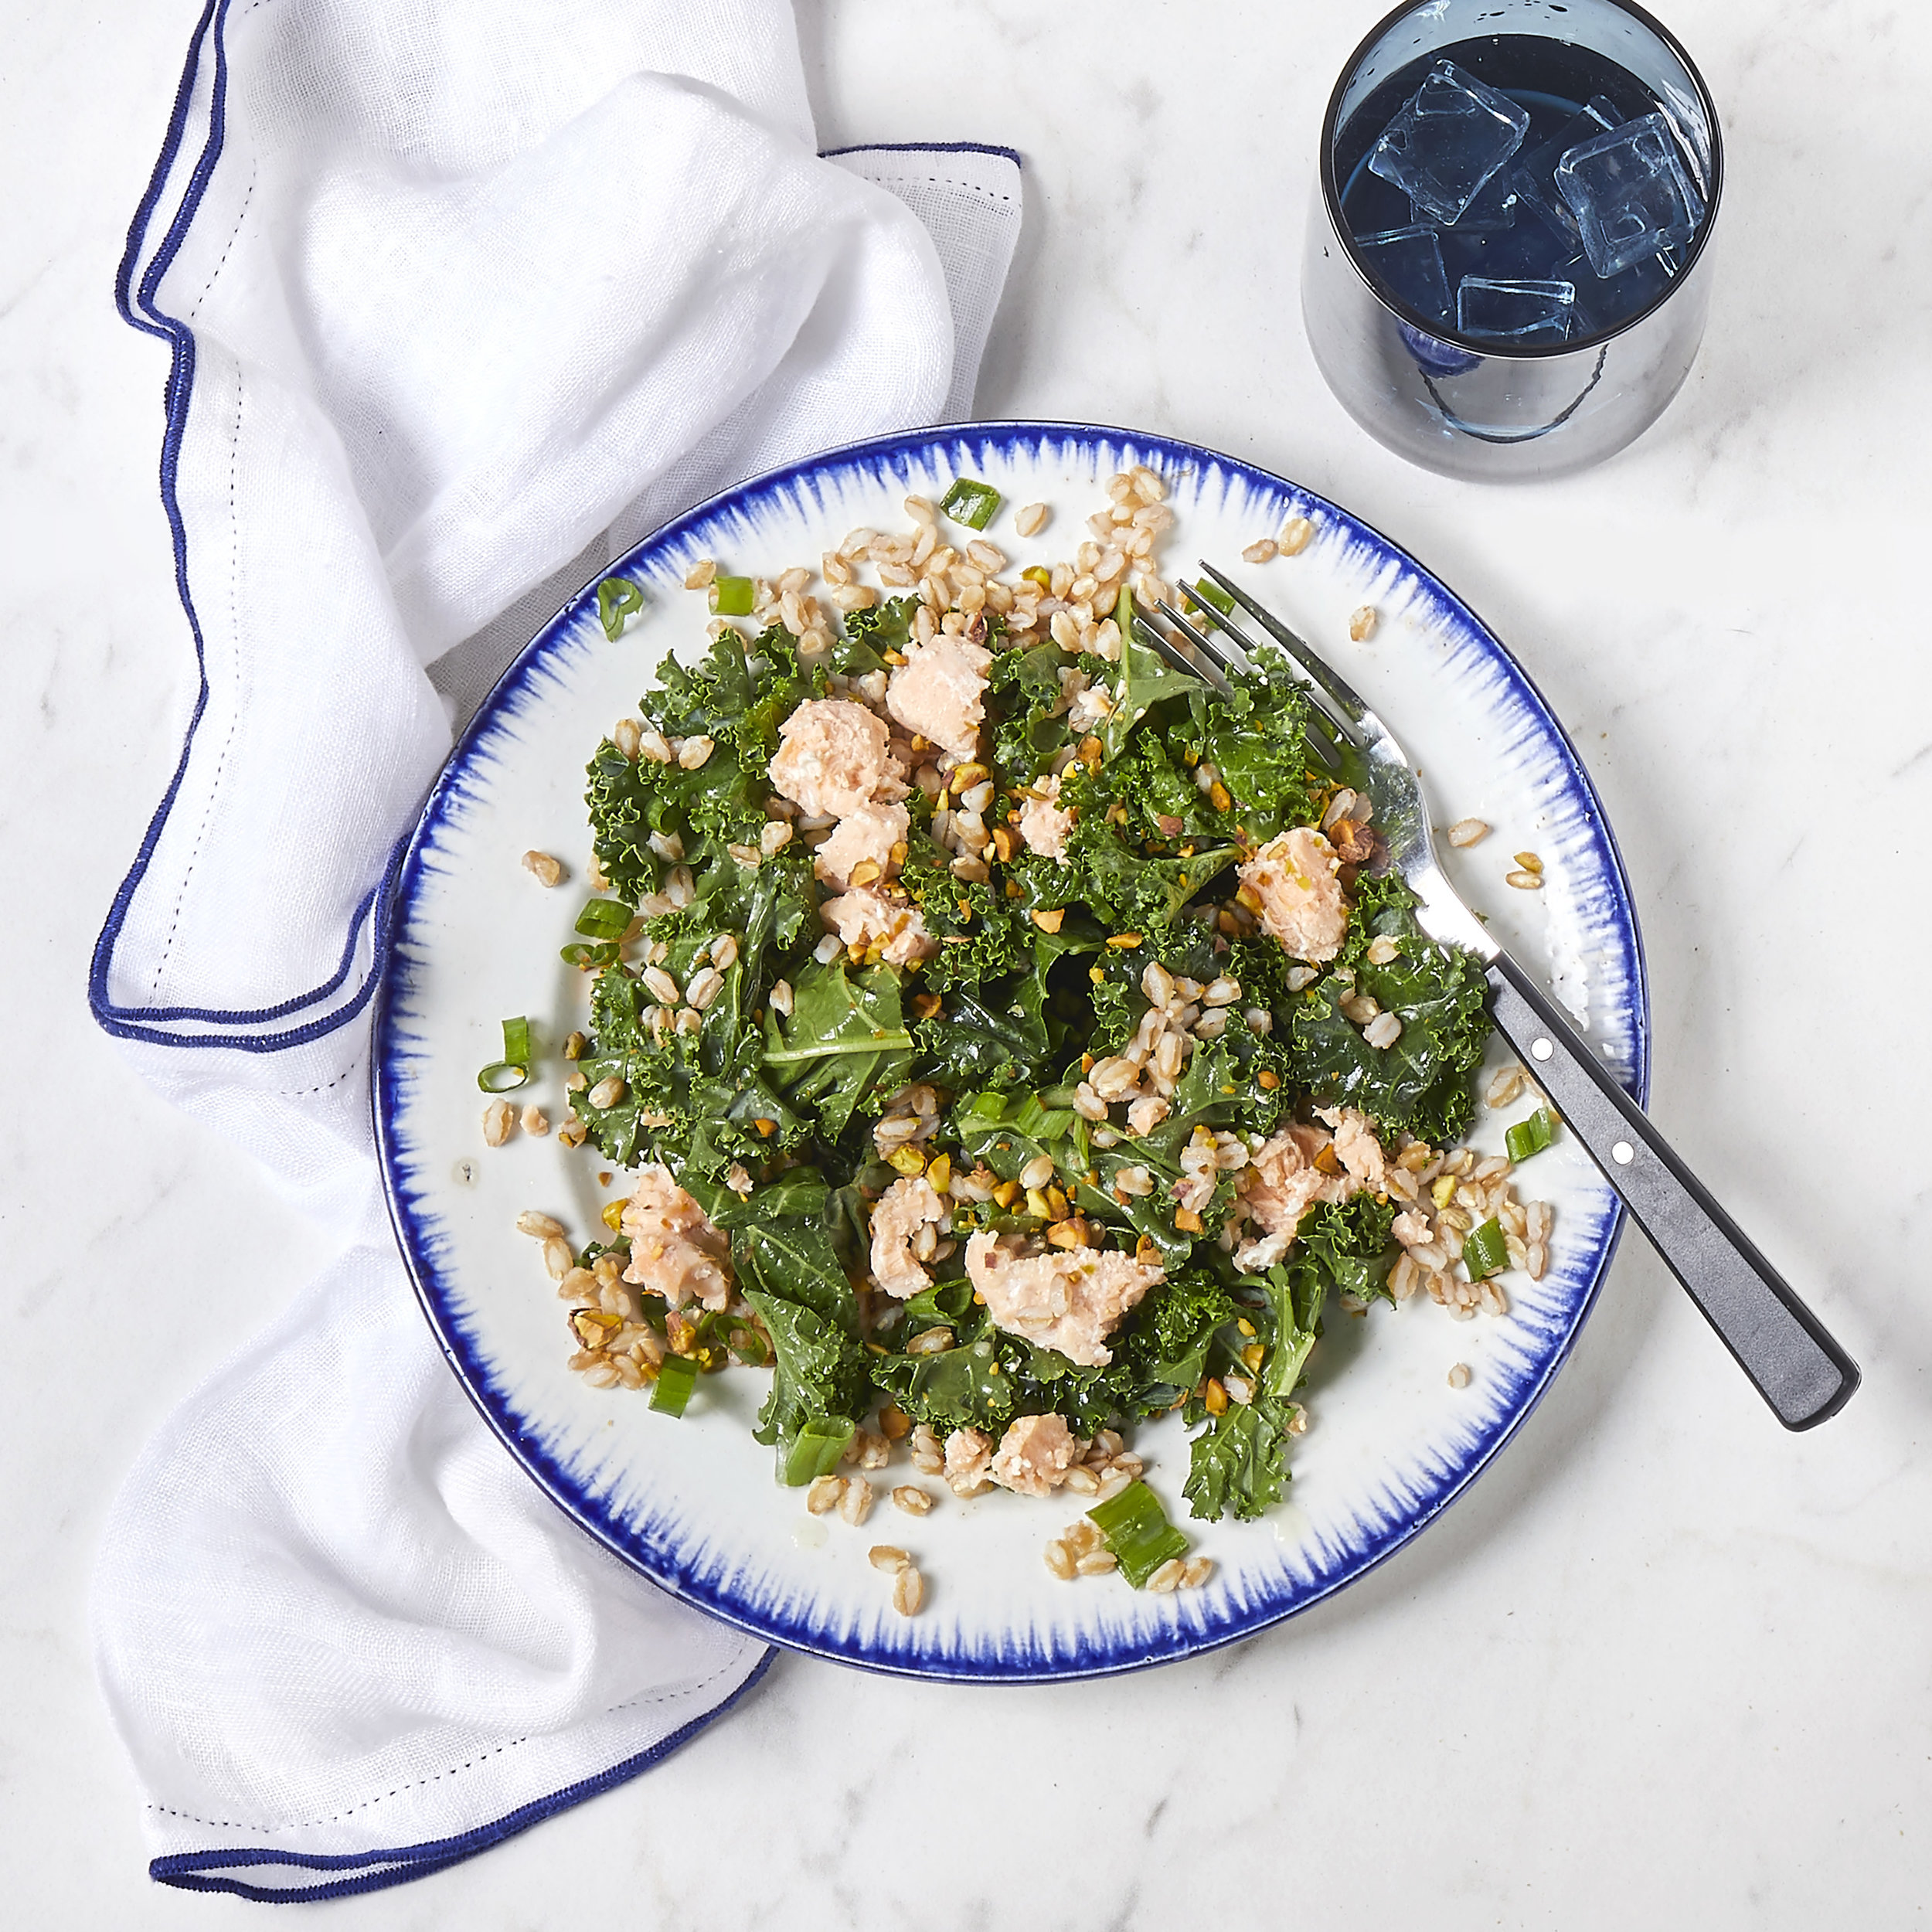 Kale Farro Salad with Salmon -